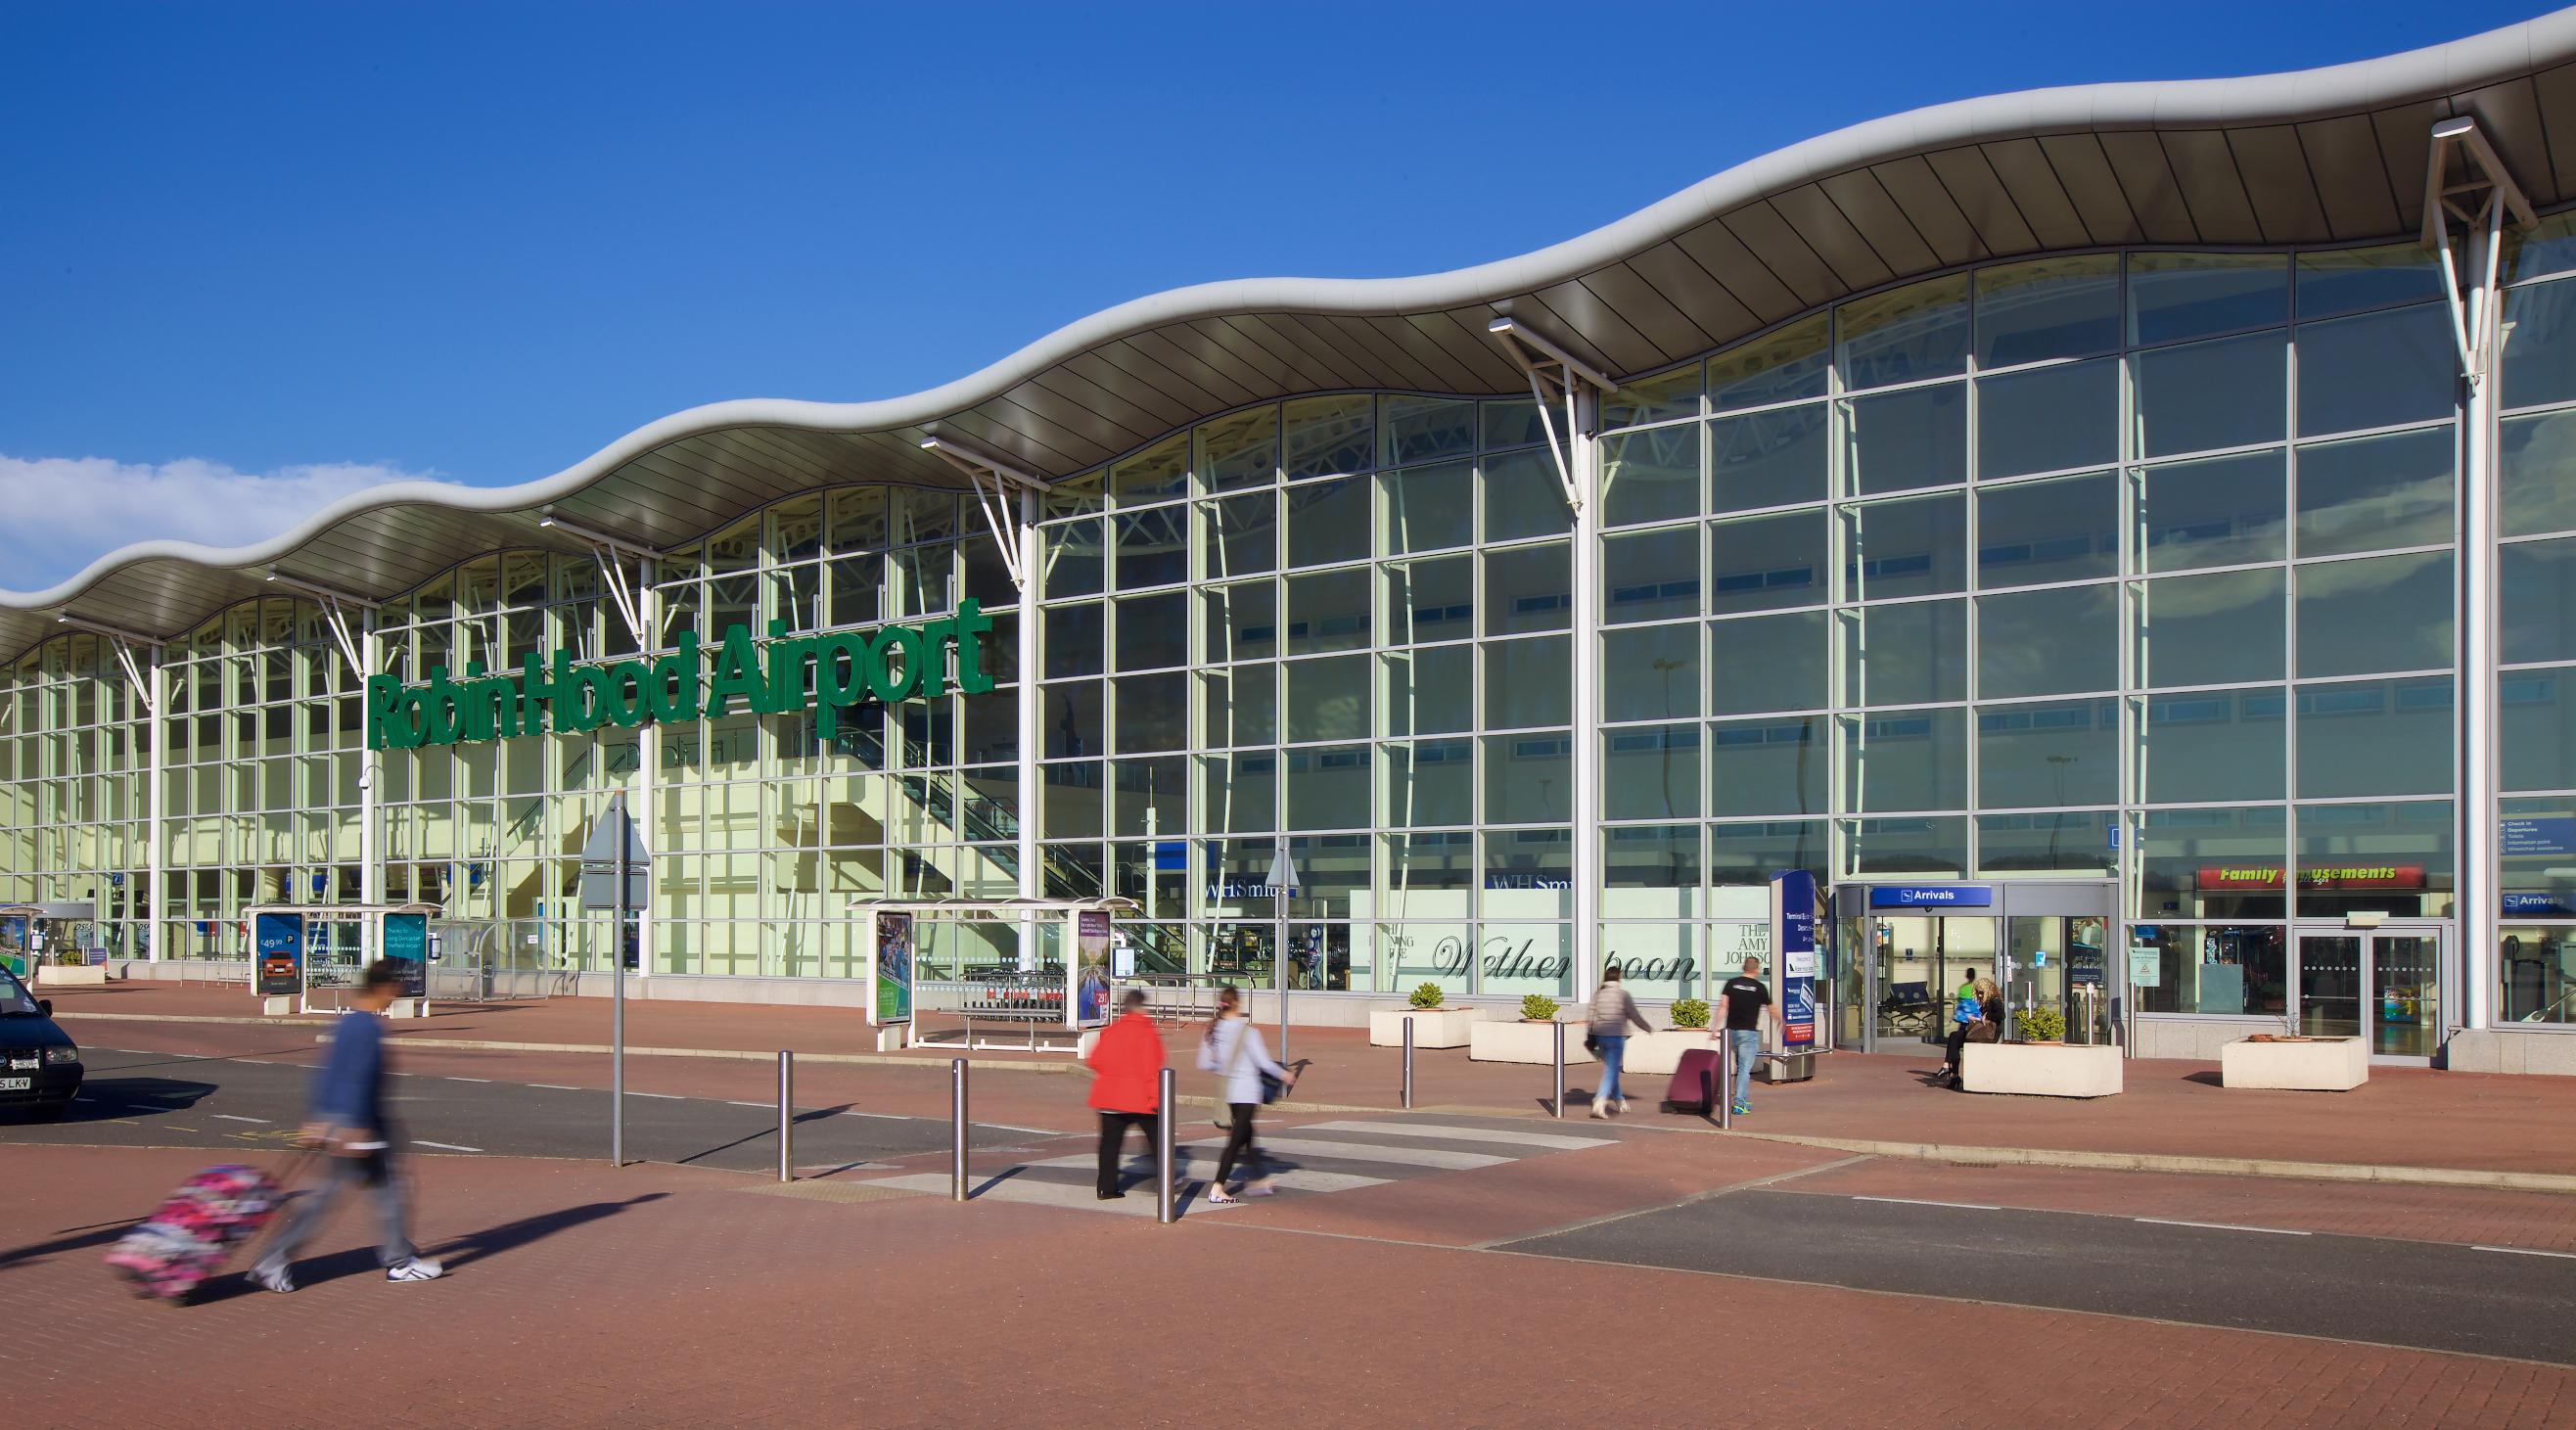 DYP_DSA Terminal 0328.jpg